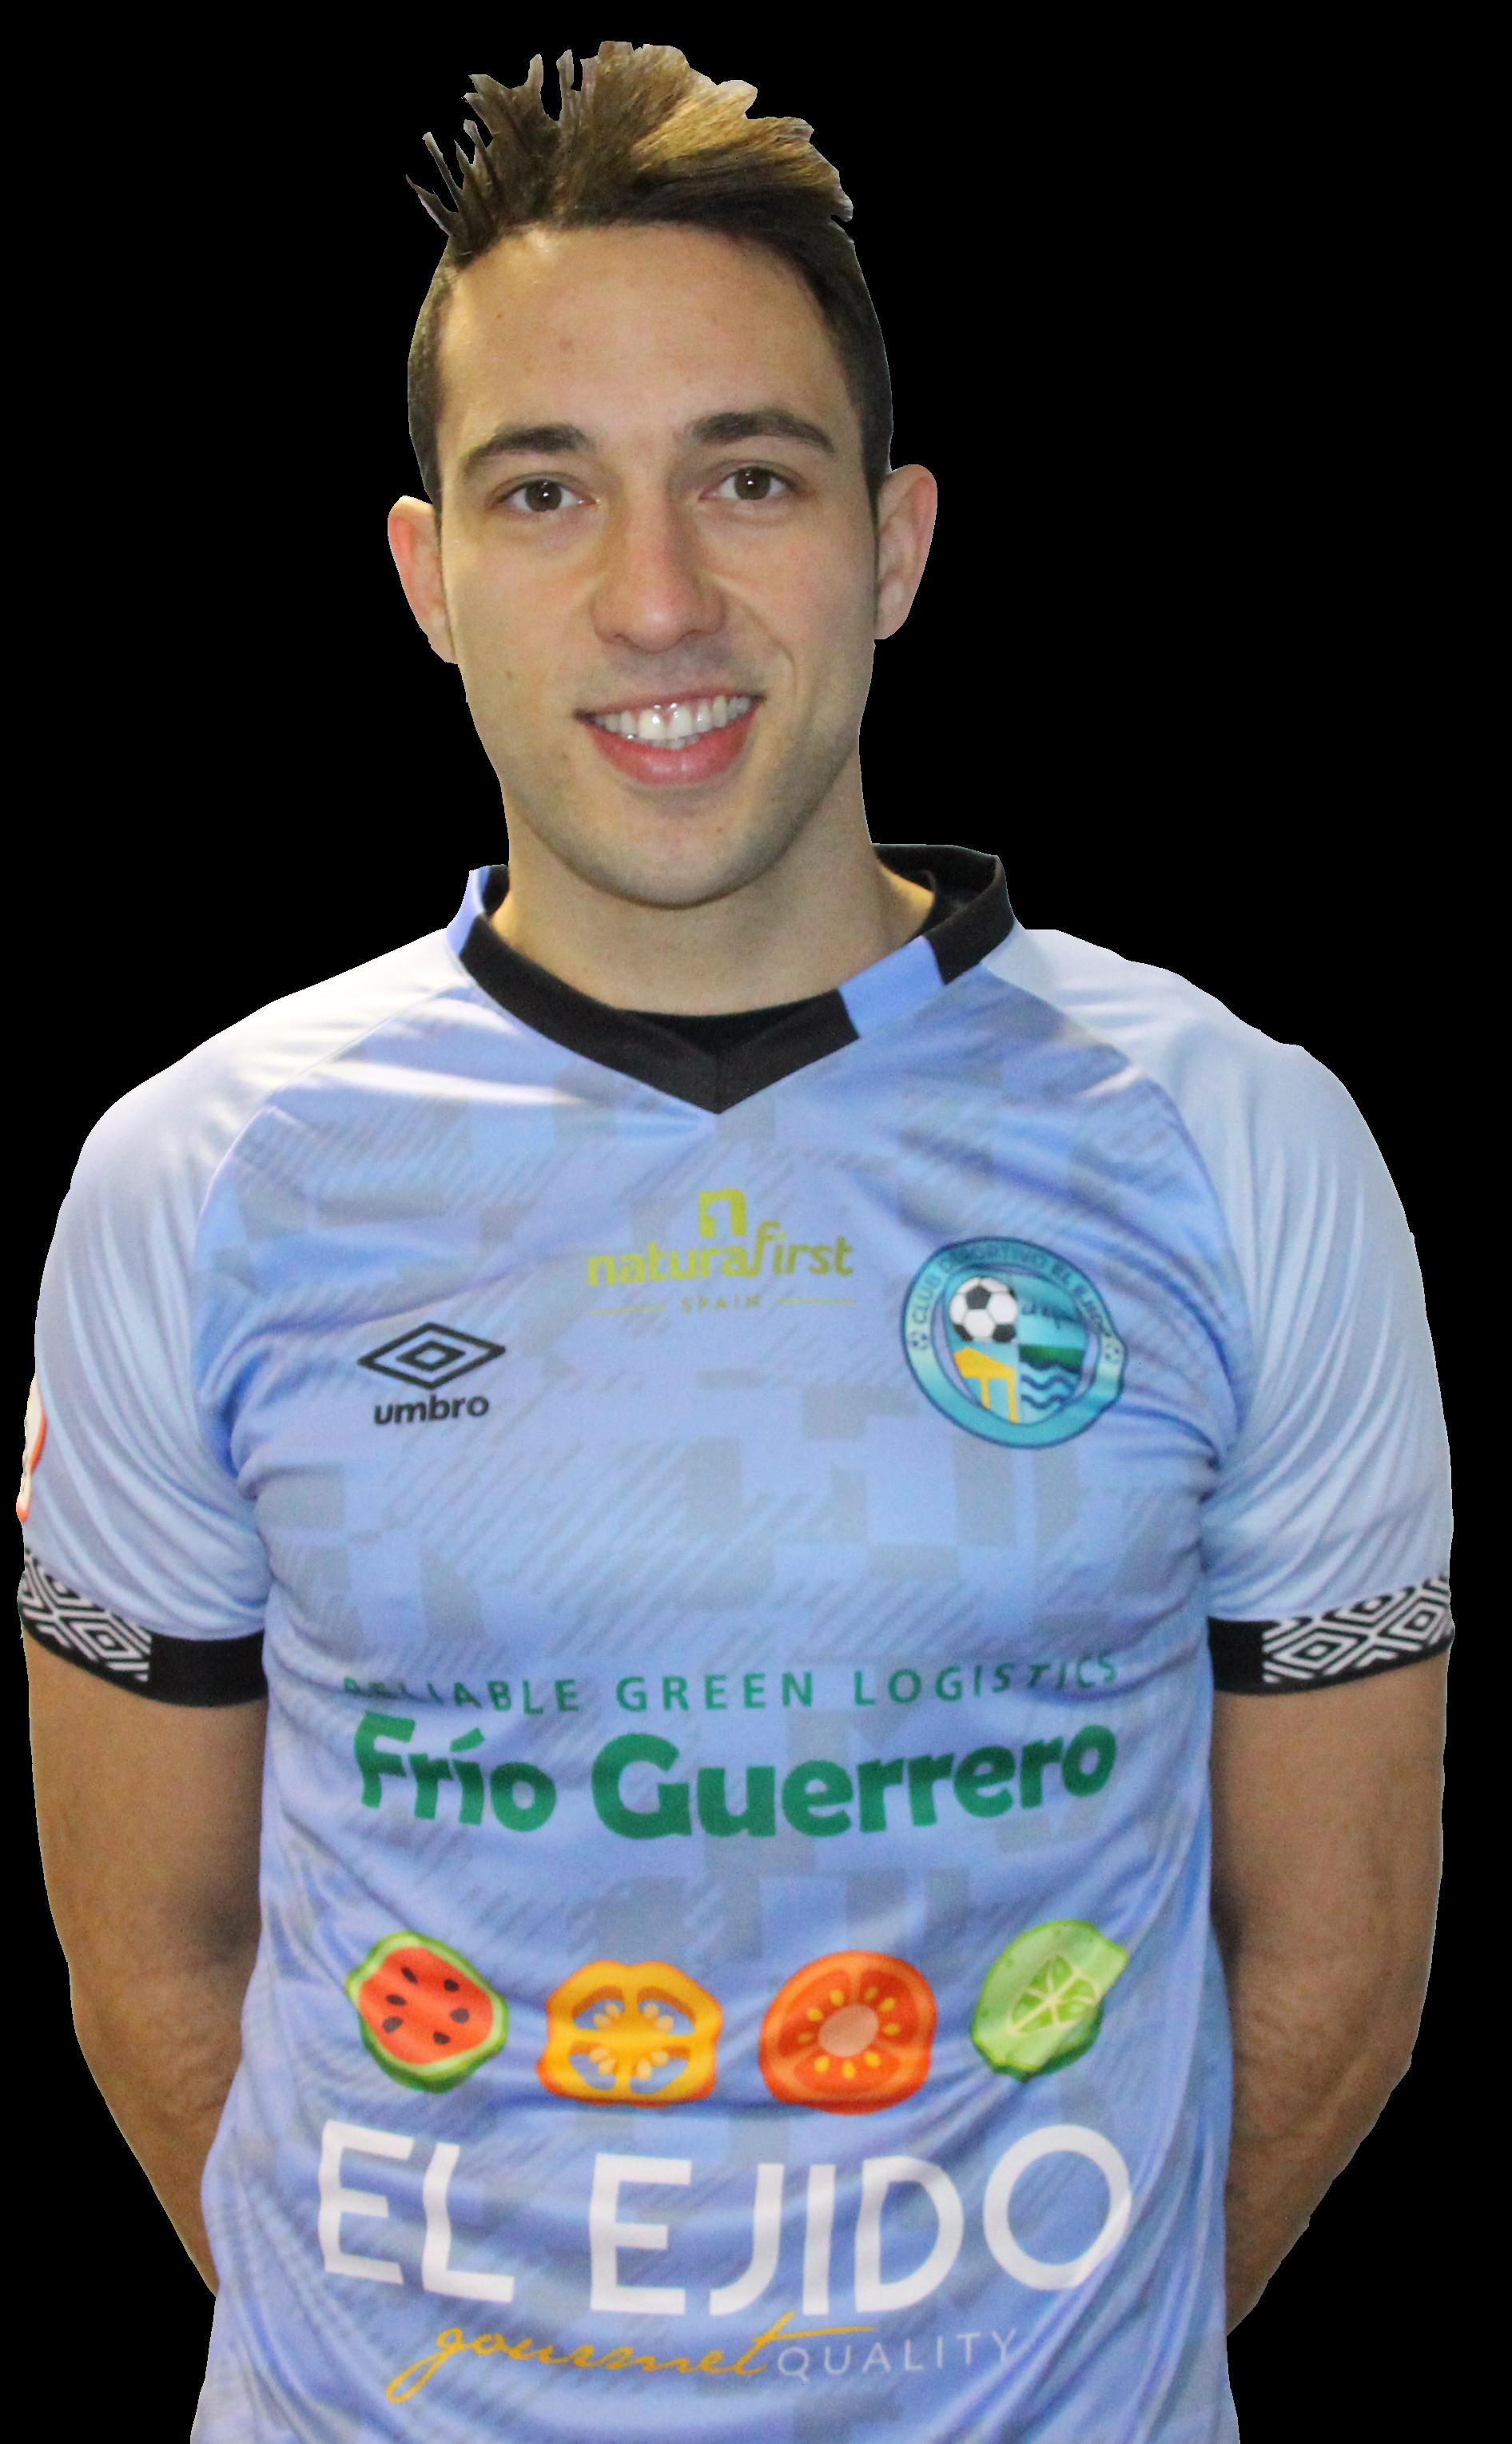 Boris Garrós Torrent